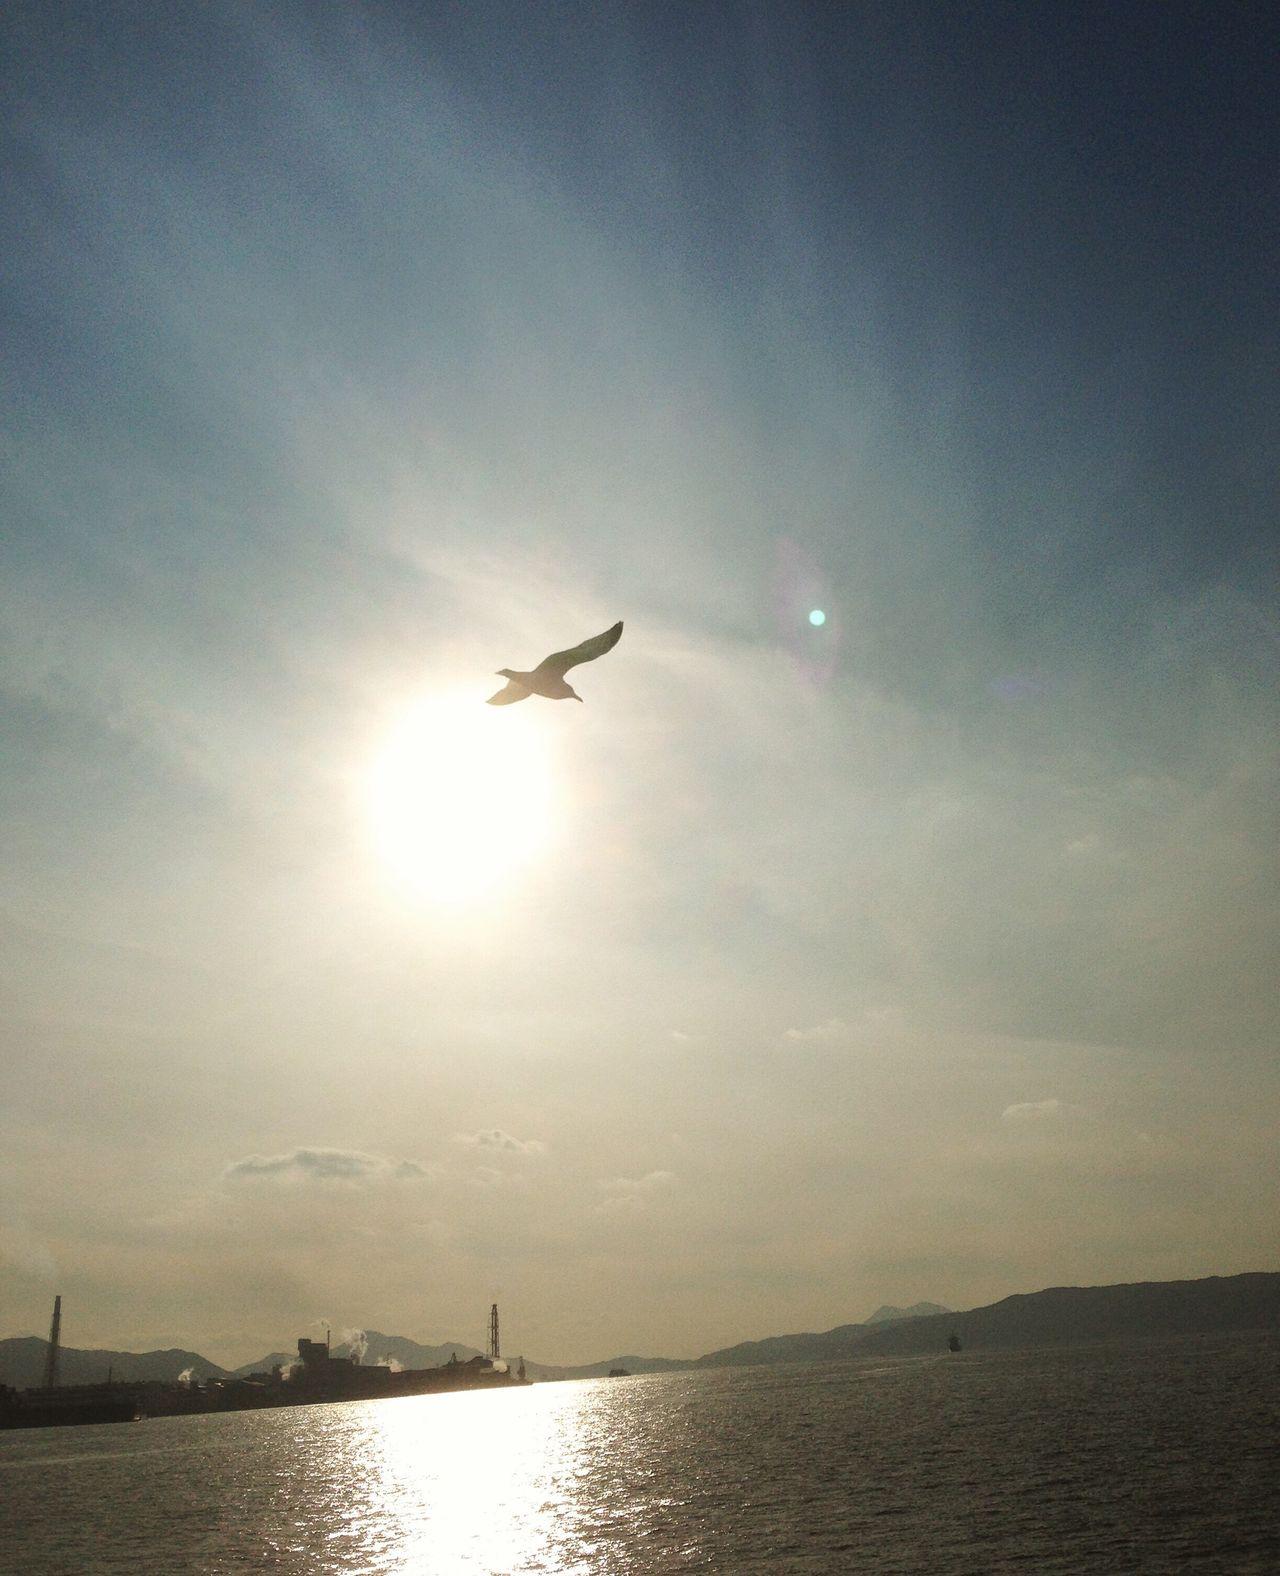 Japan/Hiroshima Sky Ocean Bird Mountain Sun Moon Japan Hiroshima Kure 日本 広島 呉 山 海 鳥 かもめ 太陽 月